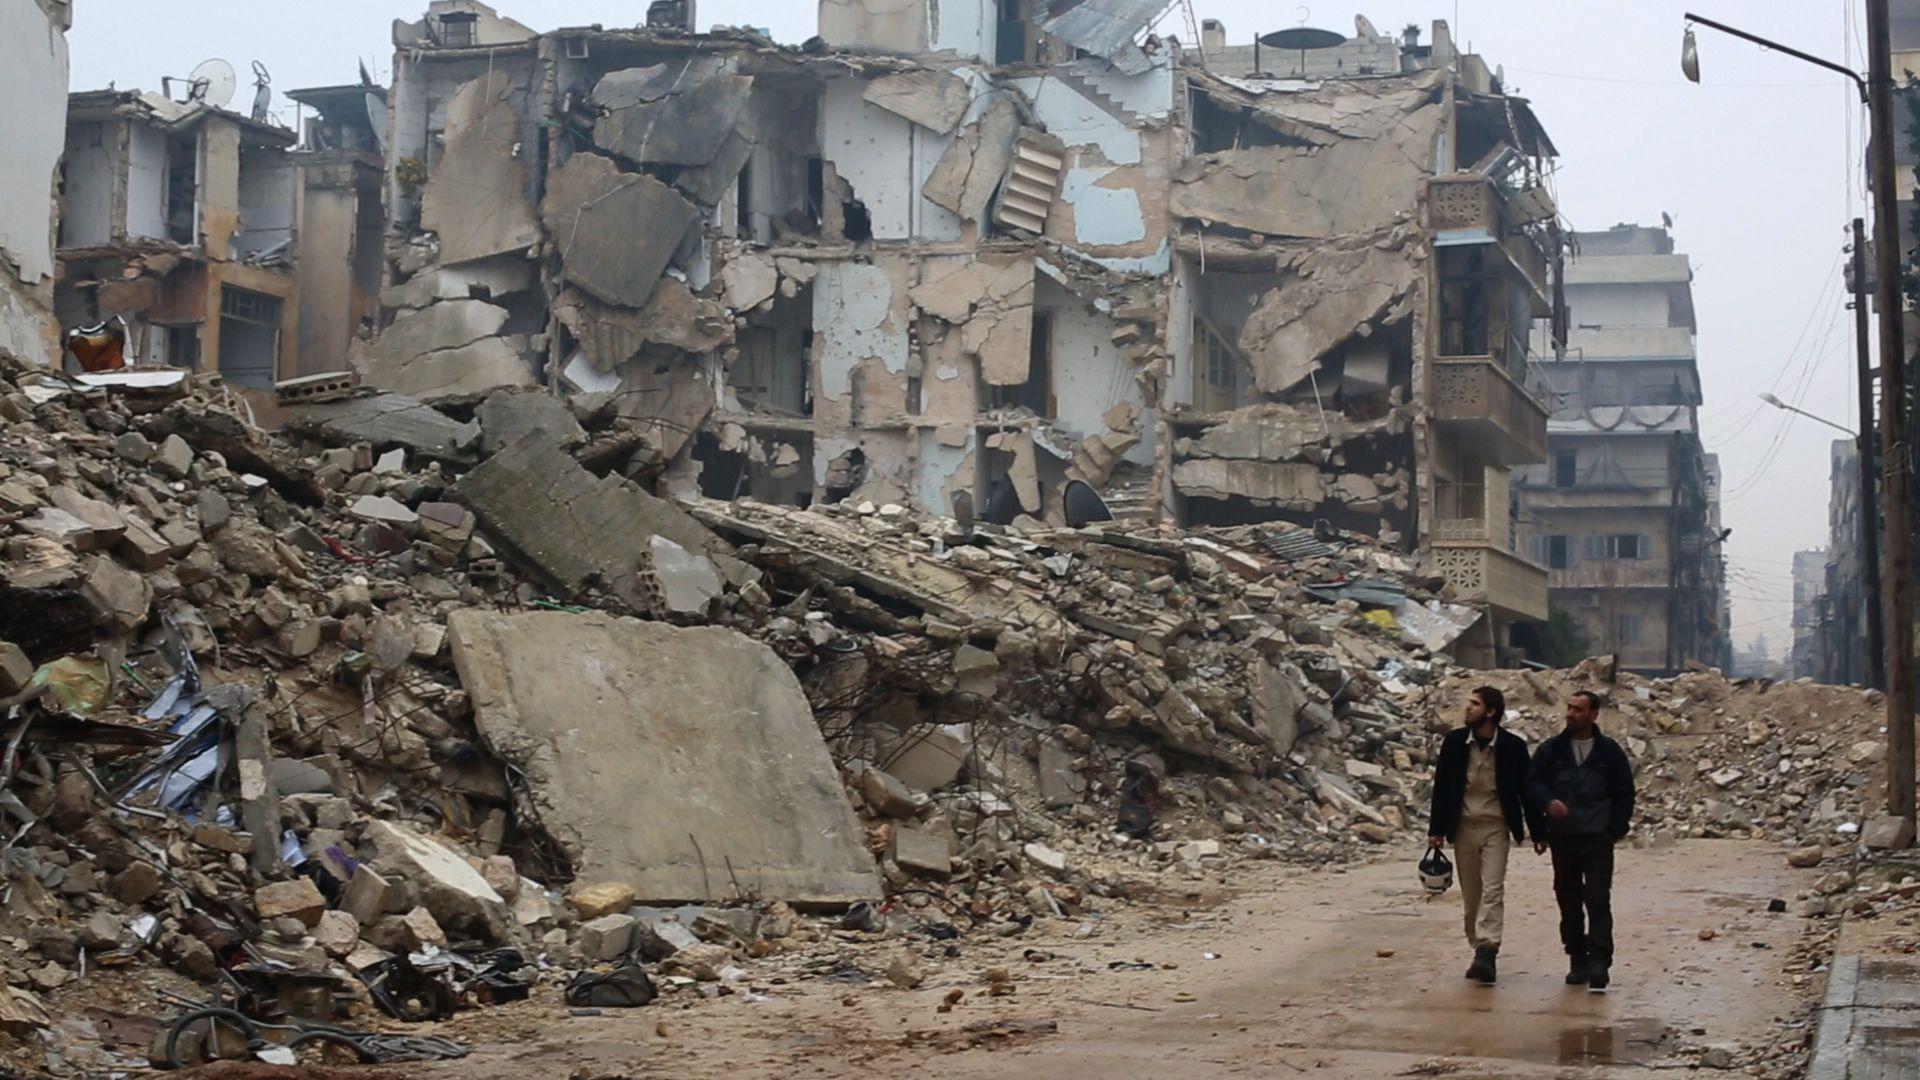 9-16-16 The White Helmets